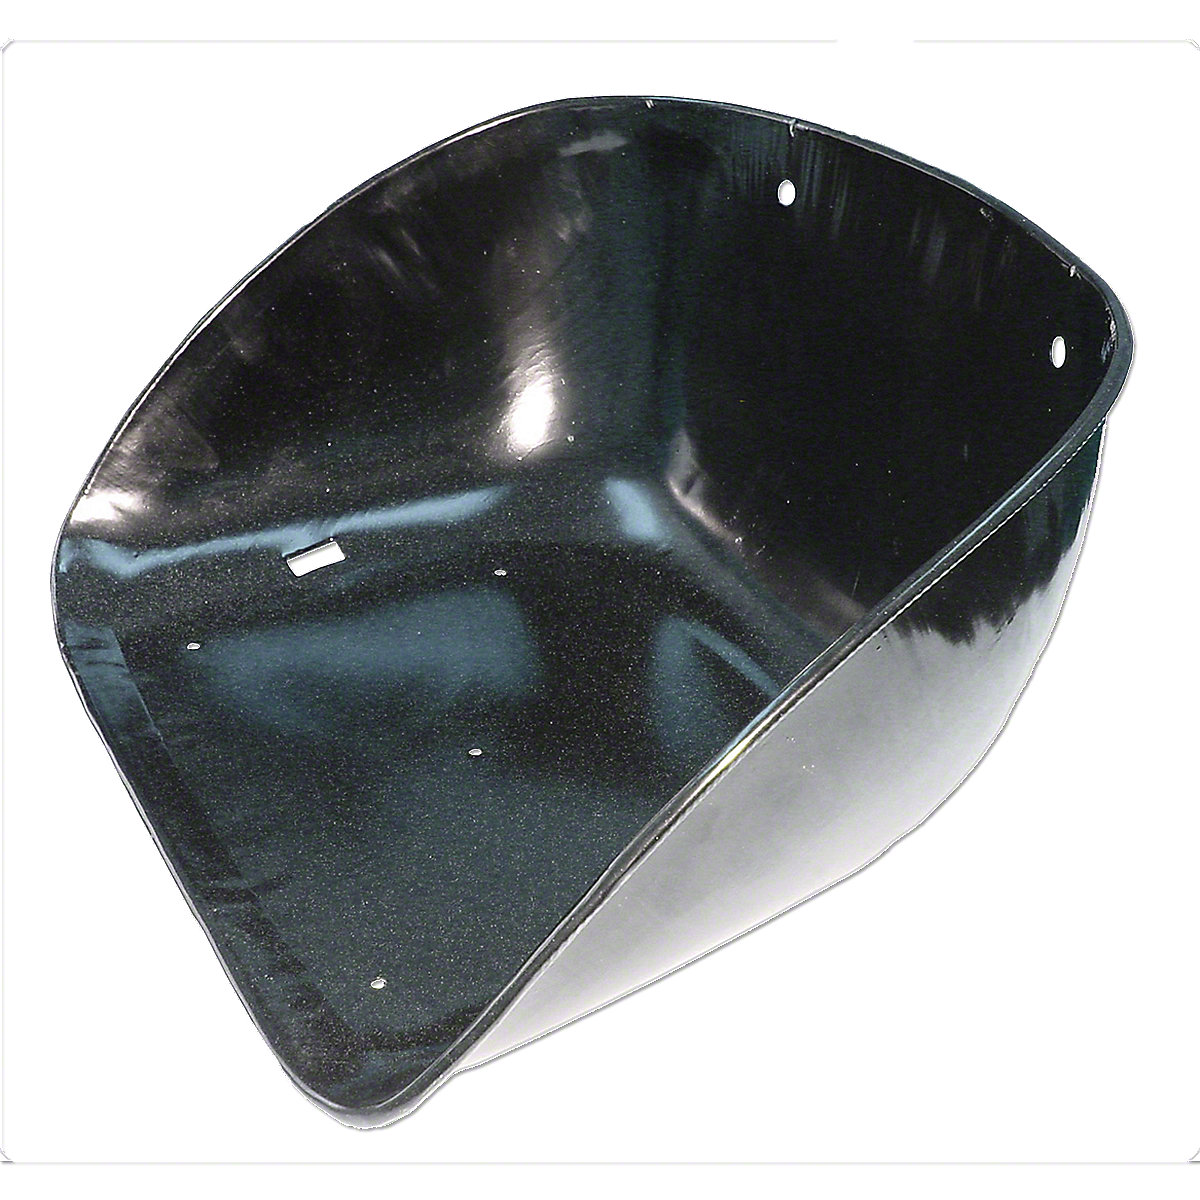 Ford Tractor Seat Metal Pan : Mfs metal bucket seat pan for delu